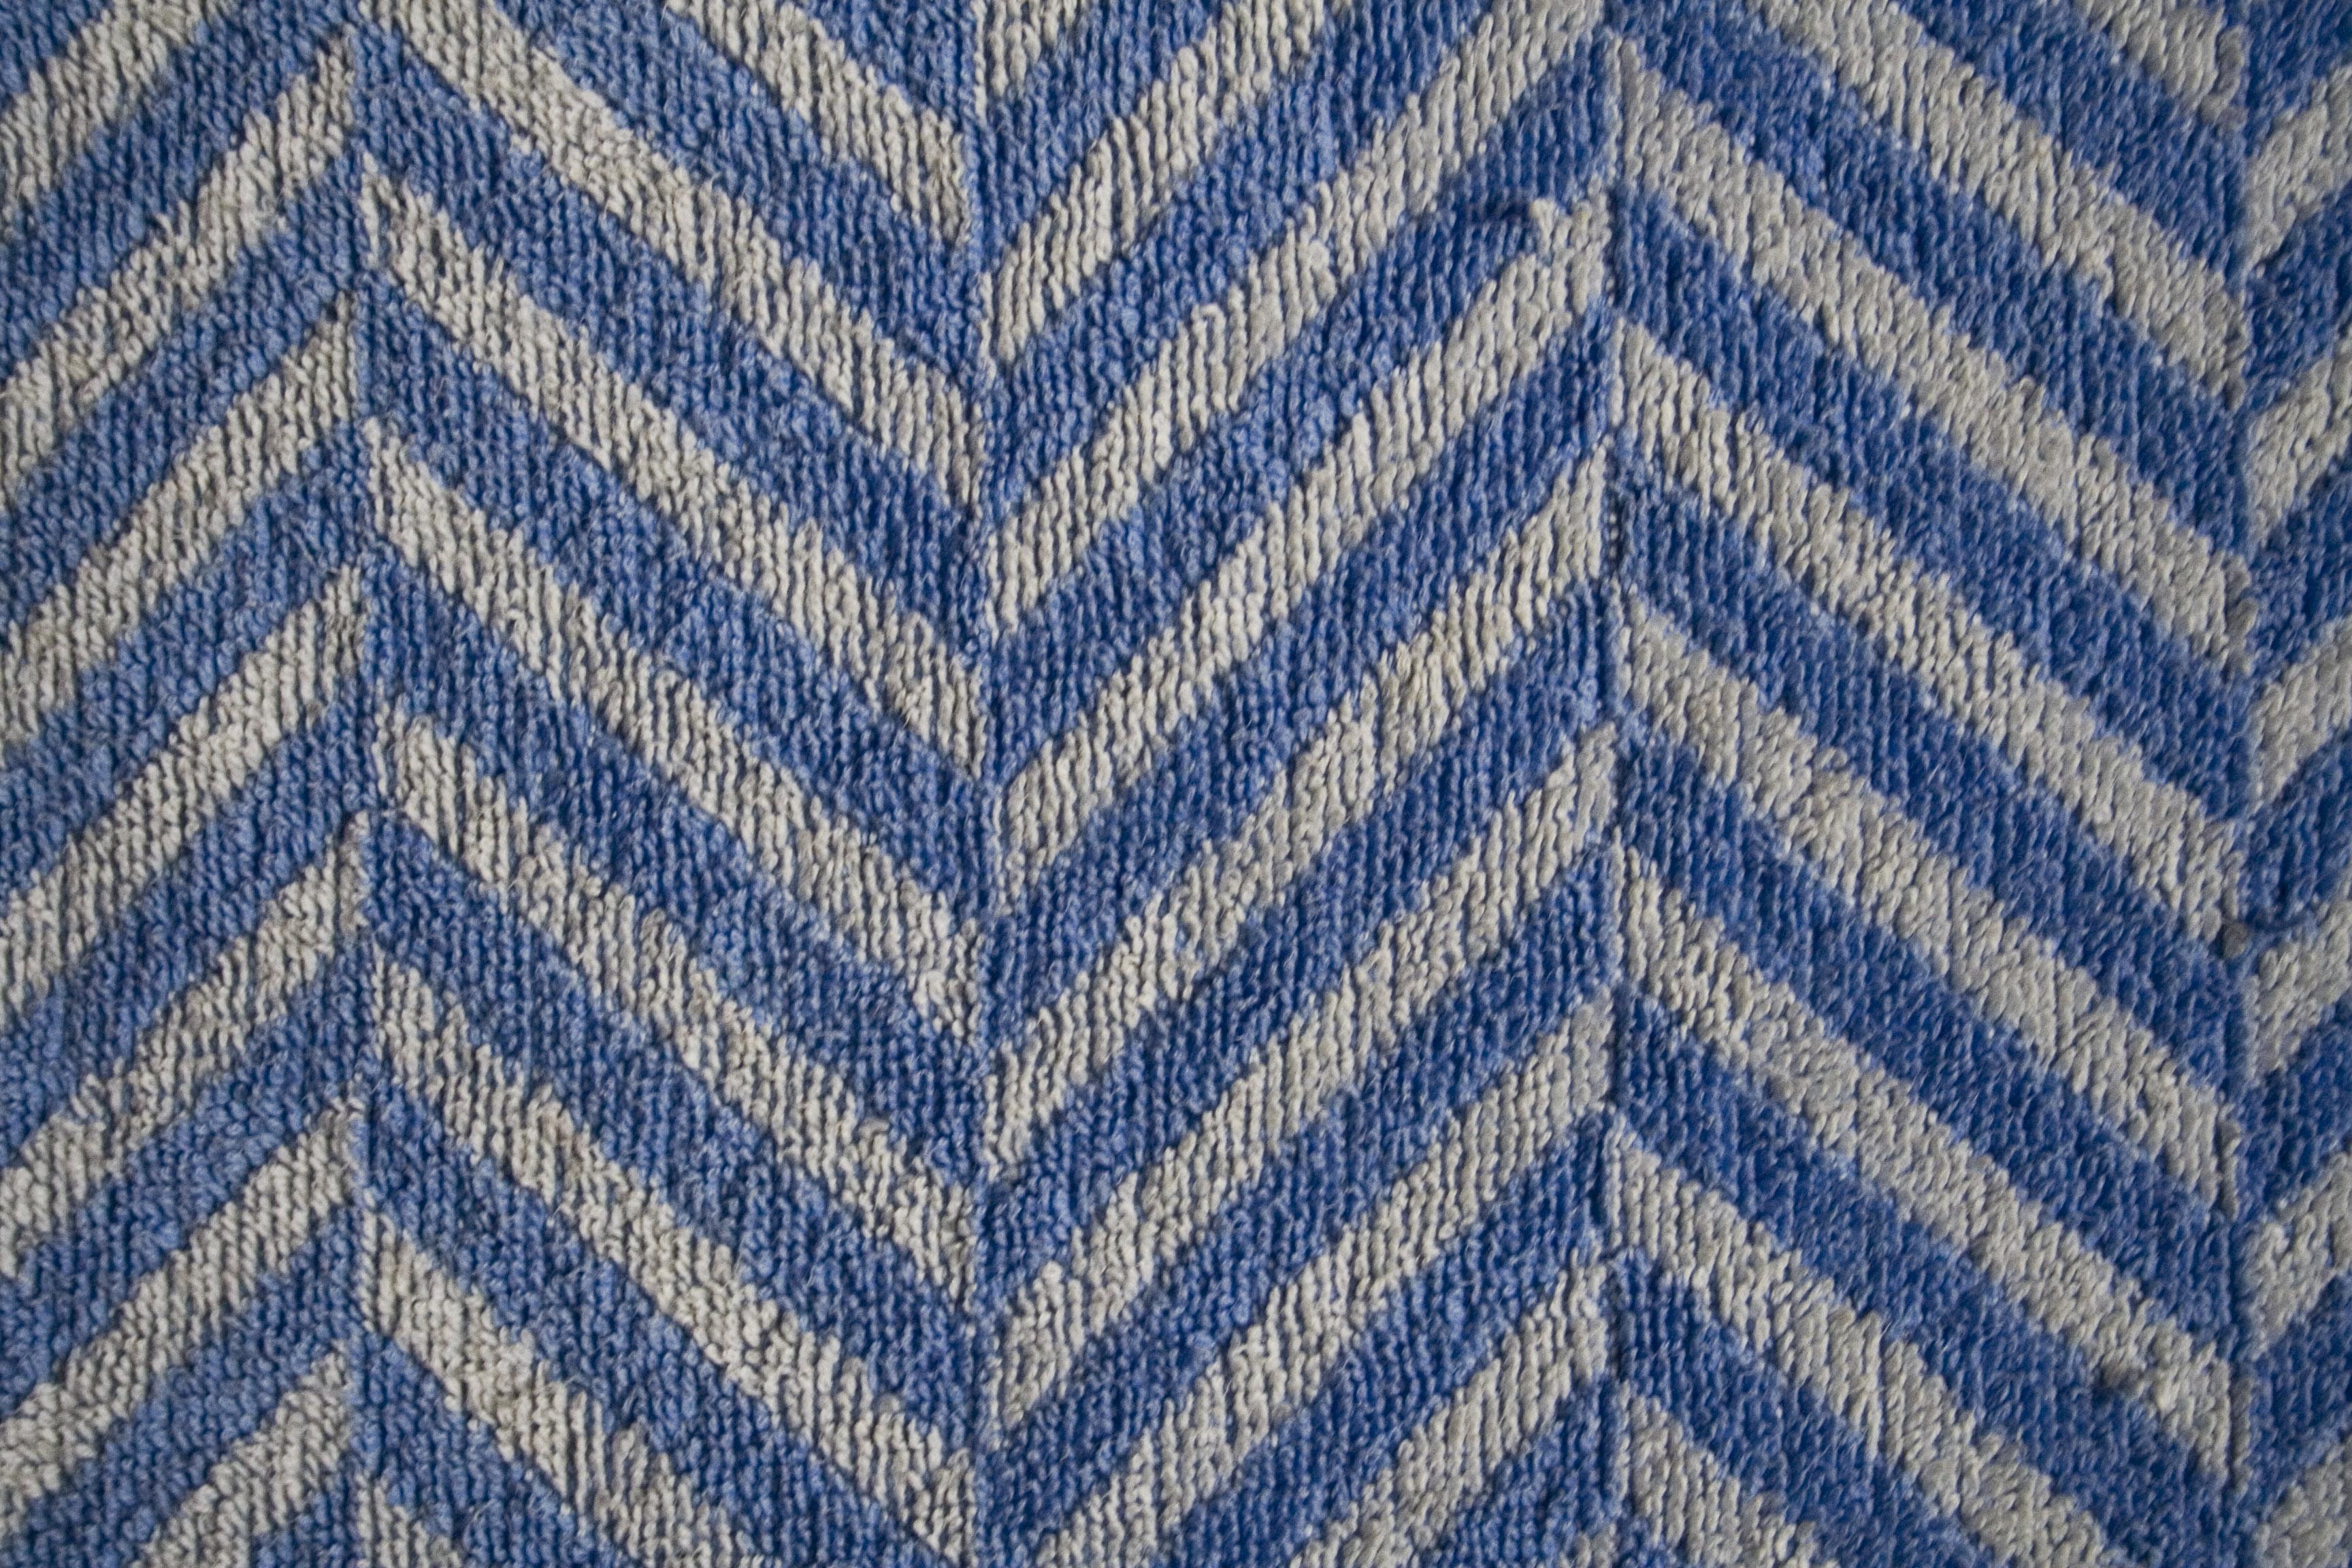 1_textile_texture_big_10_01_29.jpg